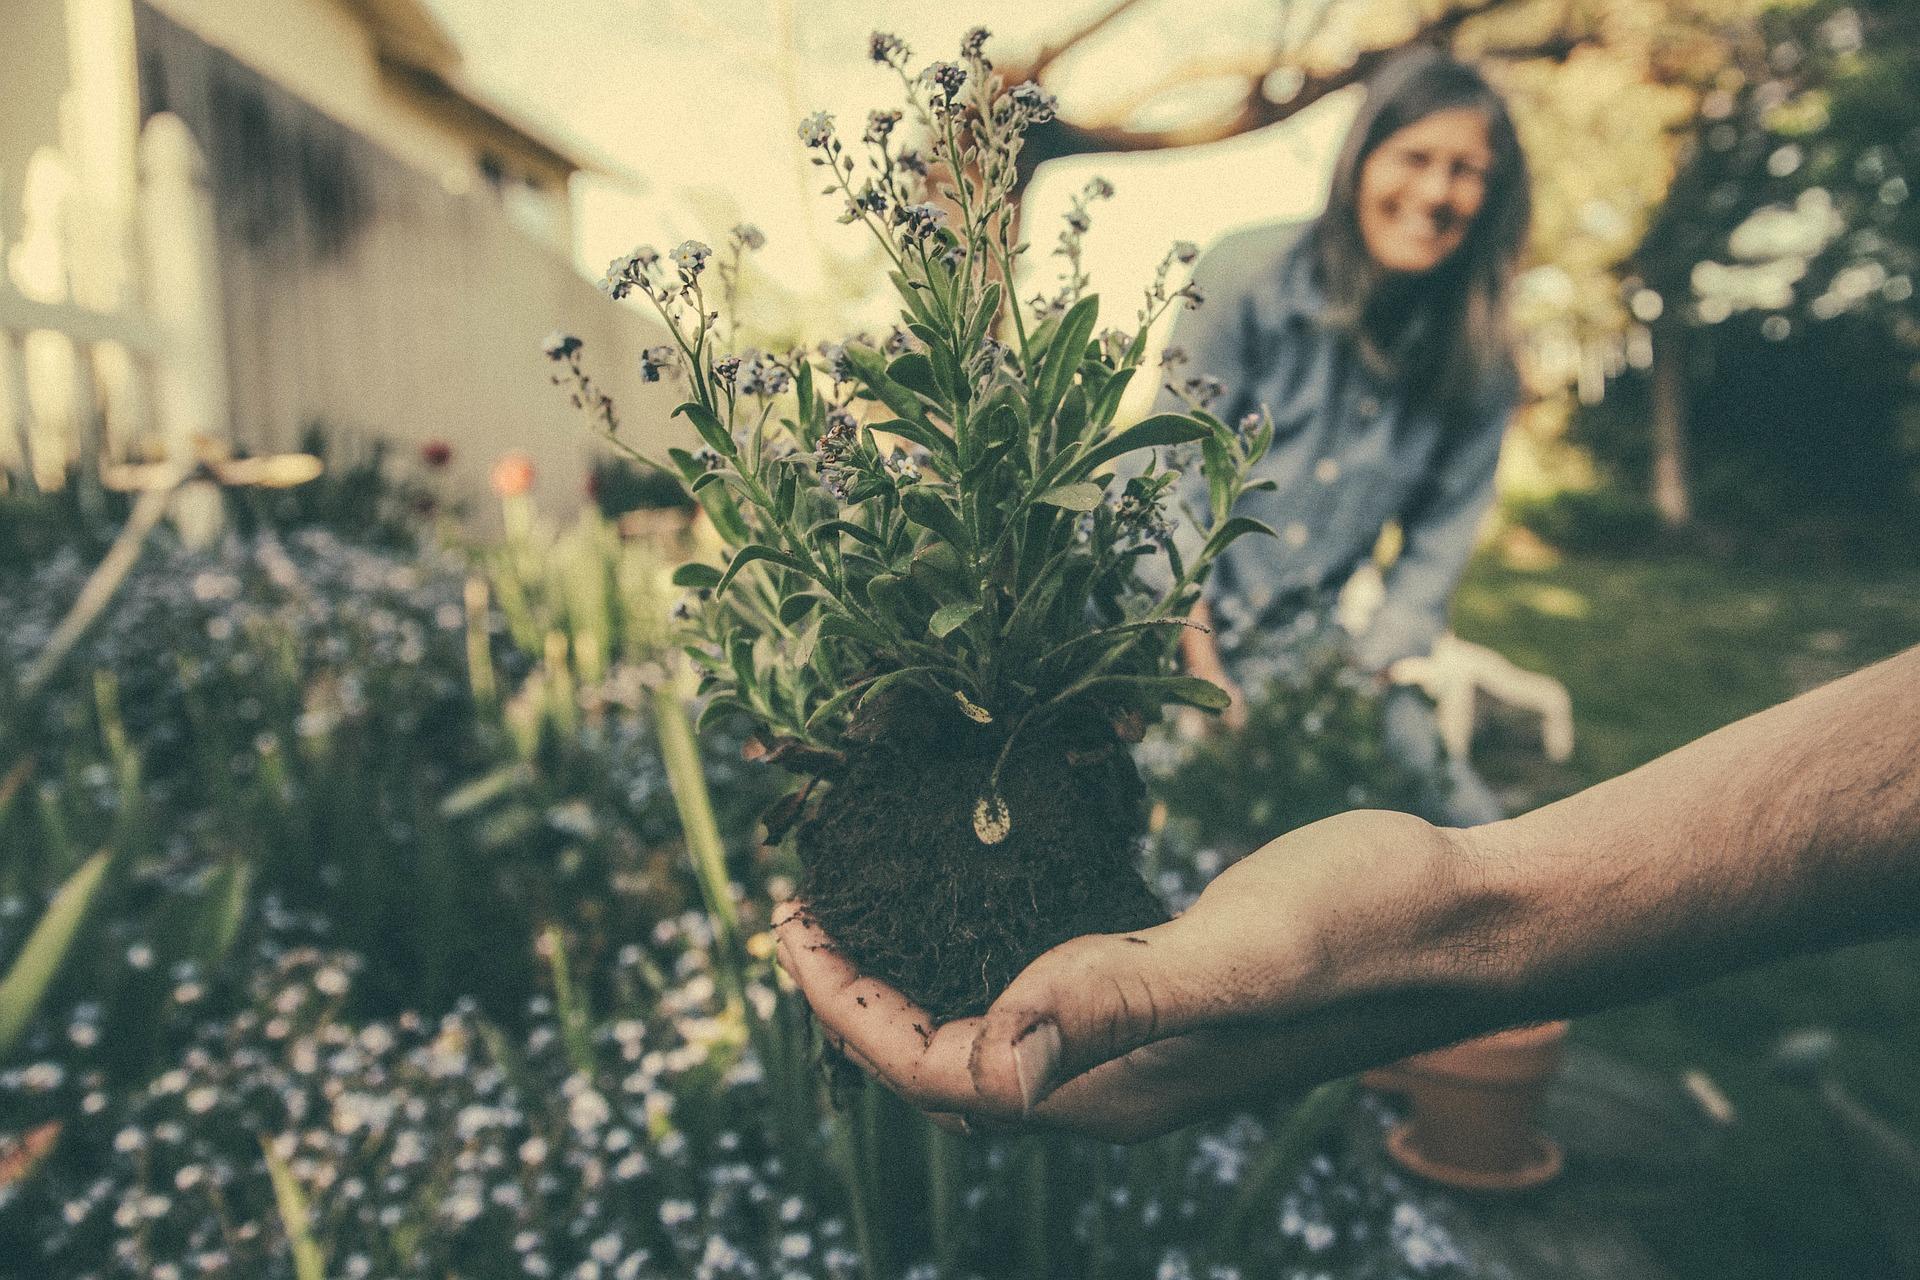 Spring flower planting advice